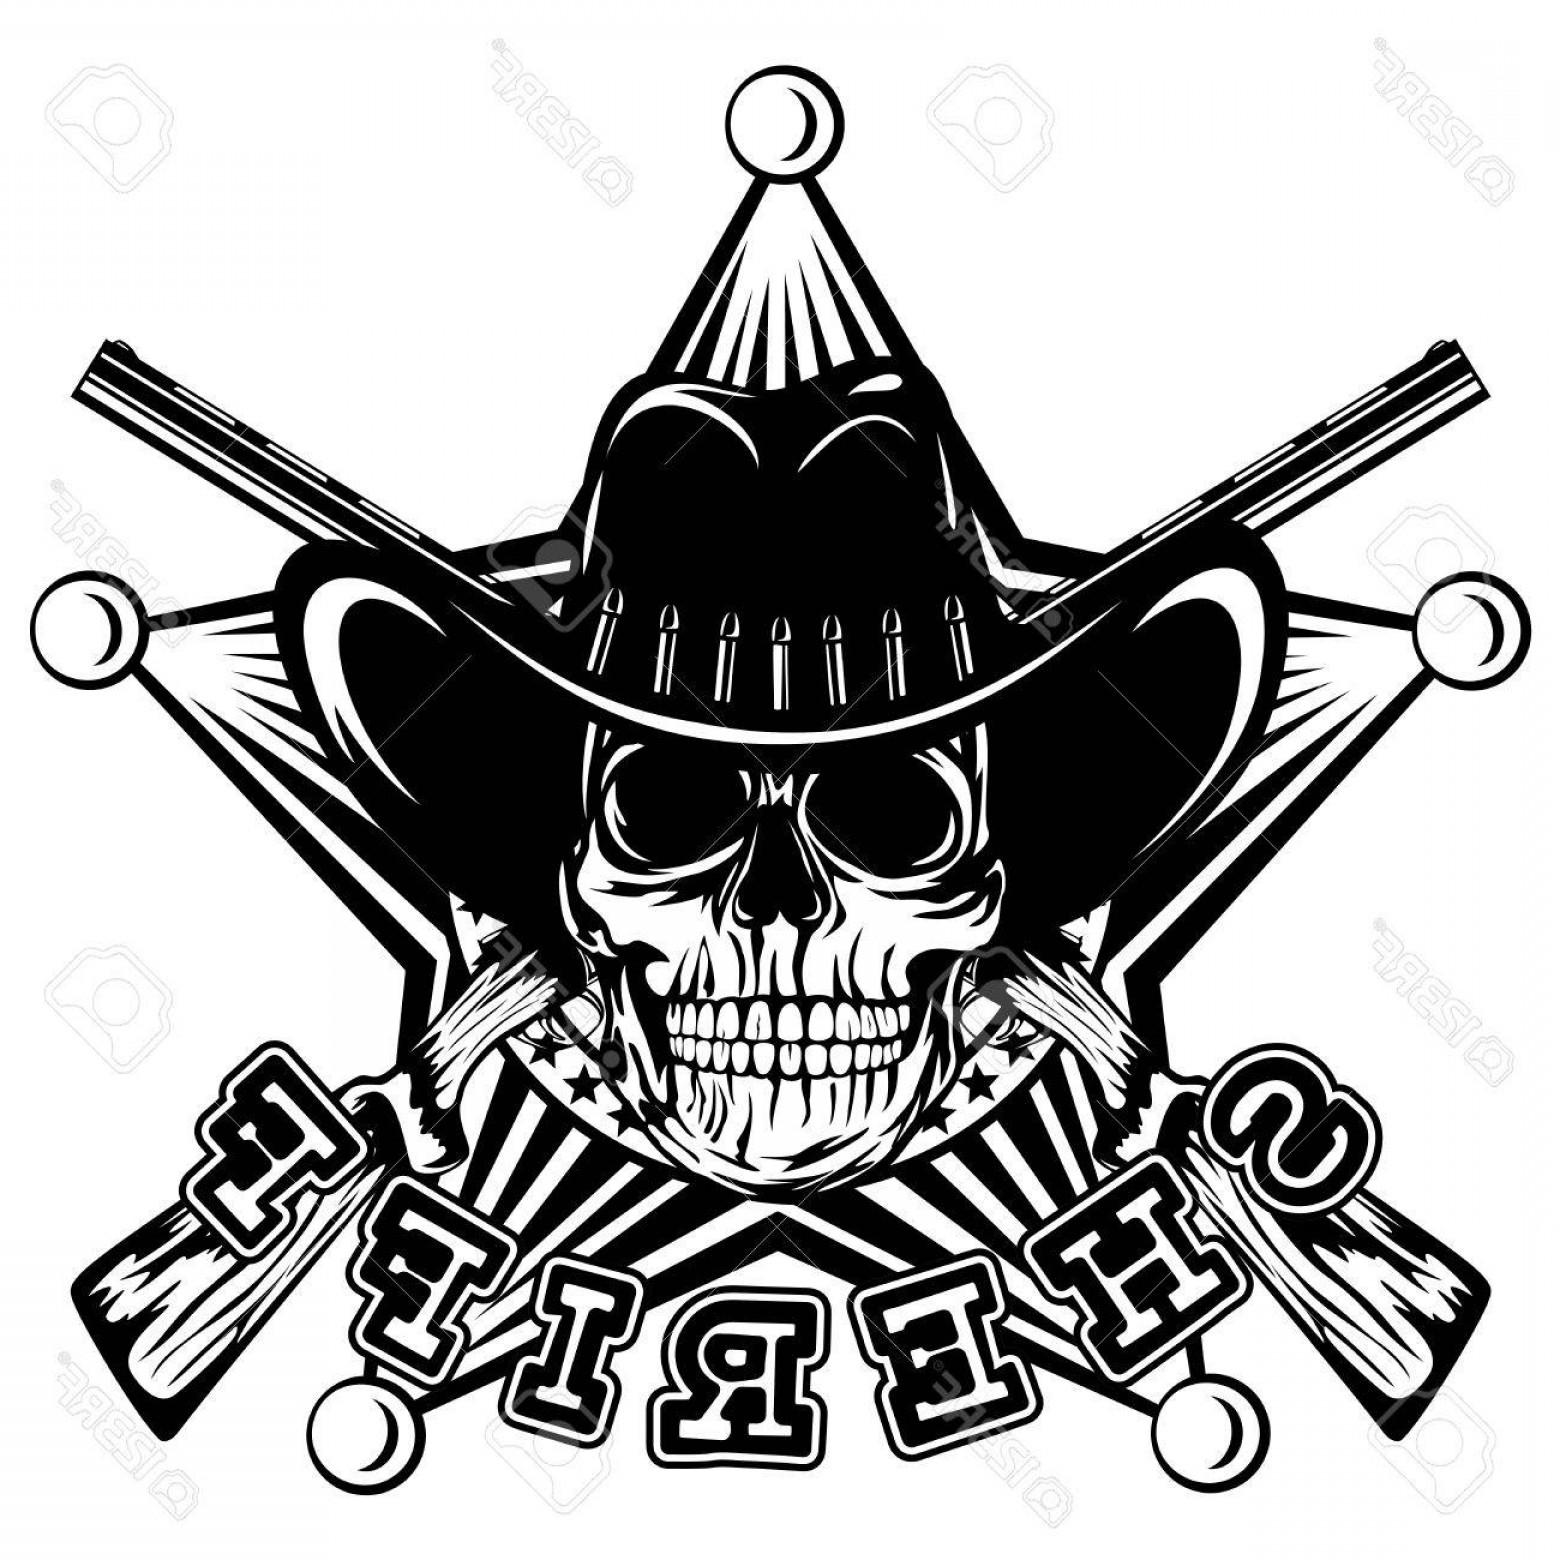 1560x1560 Photostock Vector Vector Illustration Skull In Cowboy Hat And